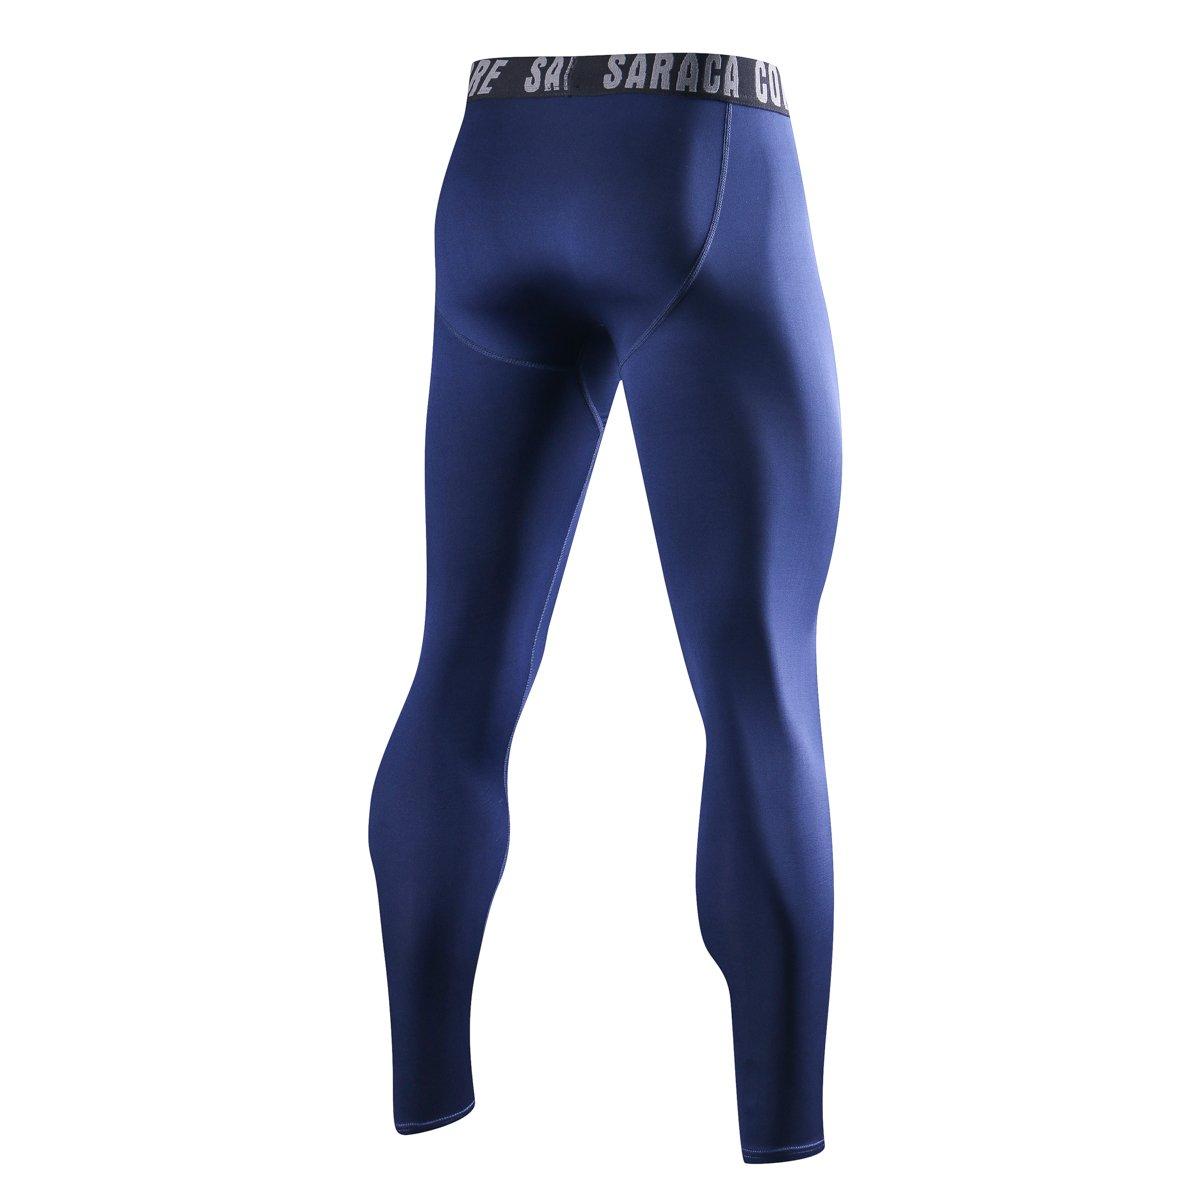 saracacore Pantalon de Compression Fitness Legging Rashguard Homme Sport Court Musculation Baselayer